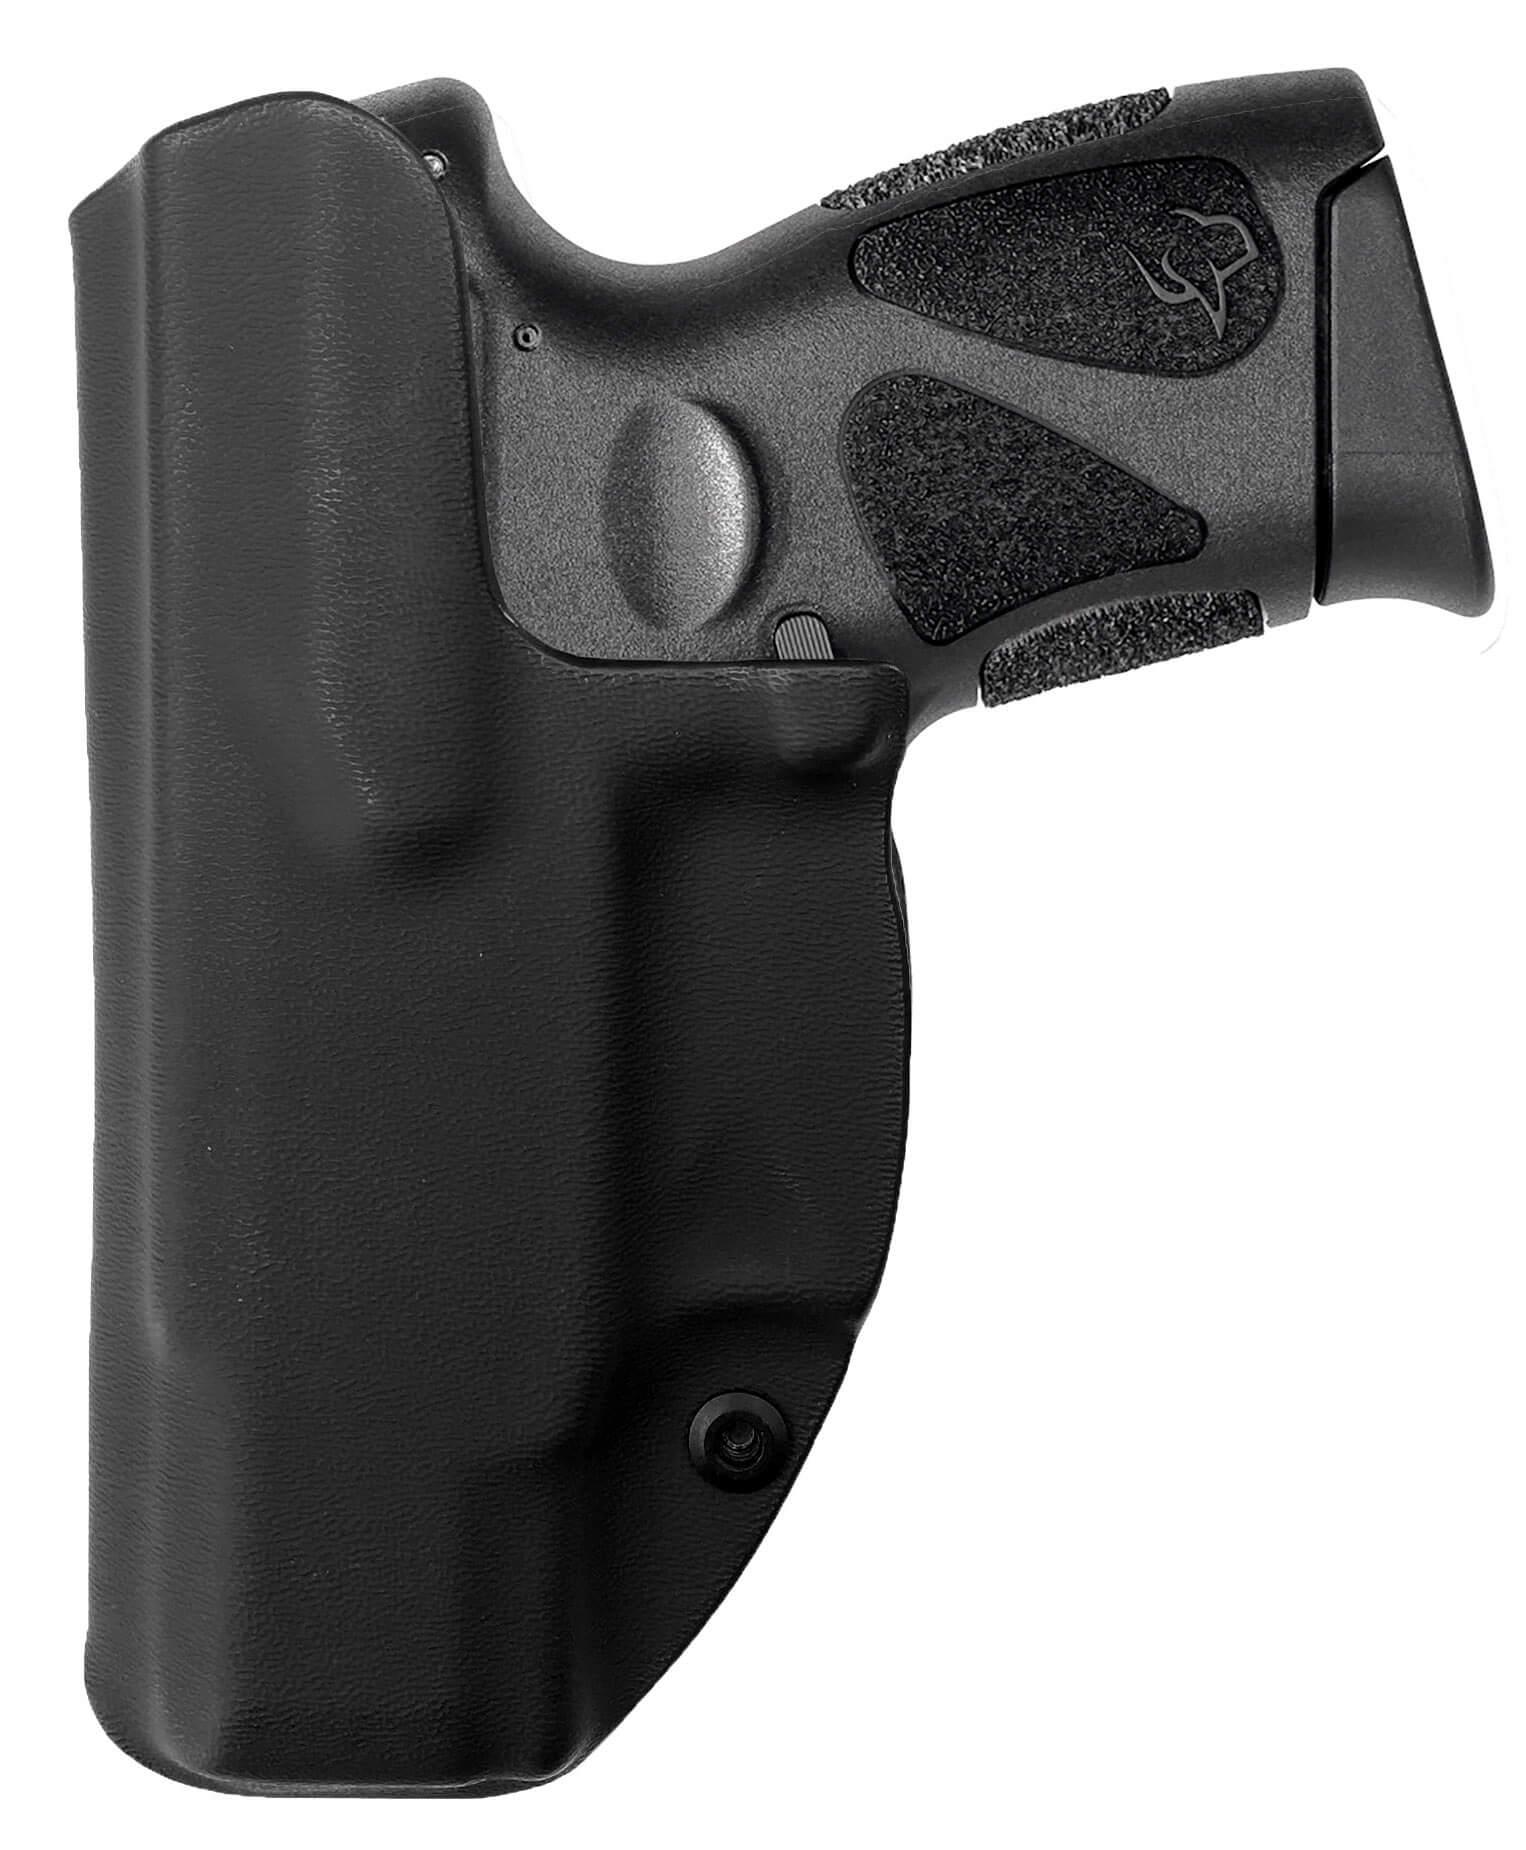 Coldre G2c 9mm Kydex Slim + 2 Porta-Carregadores Saque Rápido Velado Kydex® 080